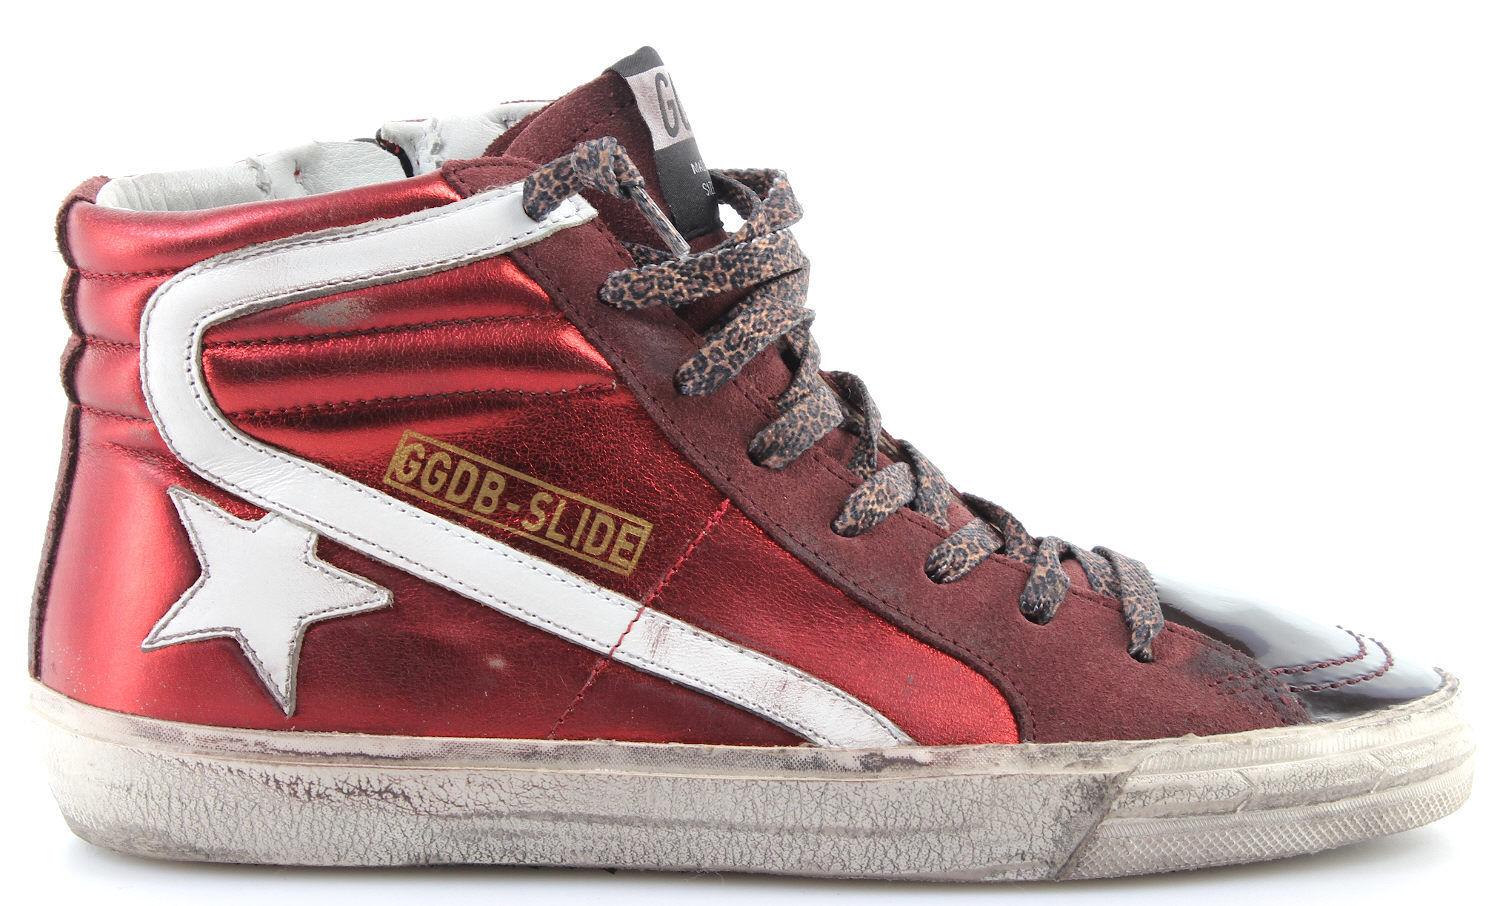 Scarpe GOOSE Sneakers Alte Donna GOLDEN GOOSE Scarpe Slide G30WS595P4 Brick Lame Bordeaux ITA 831086